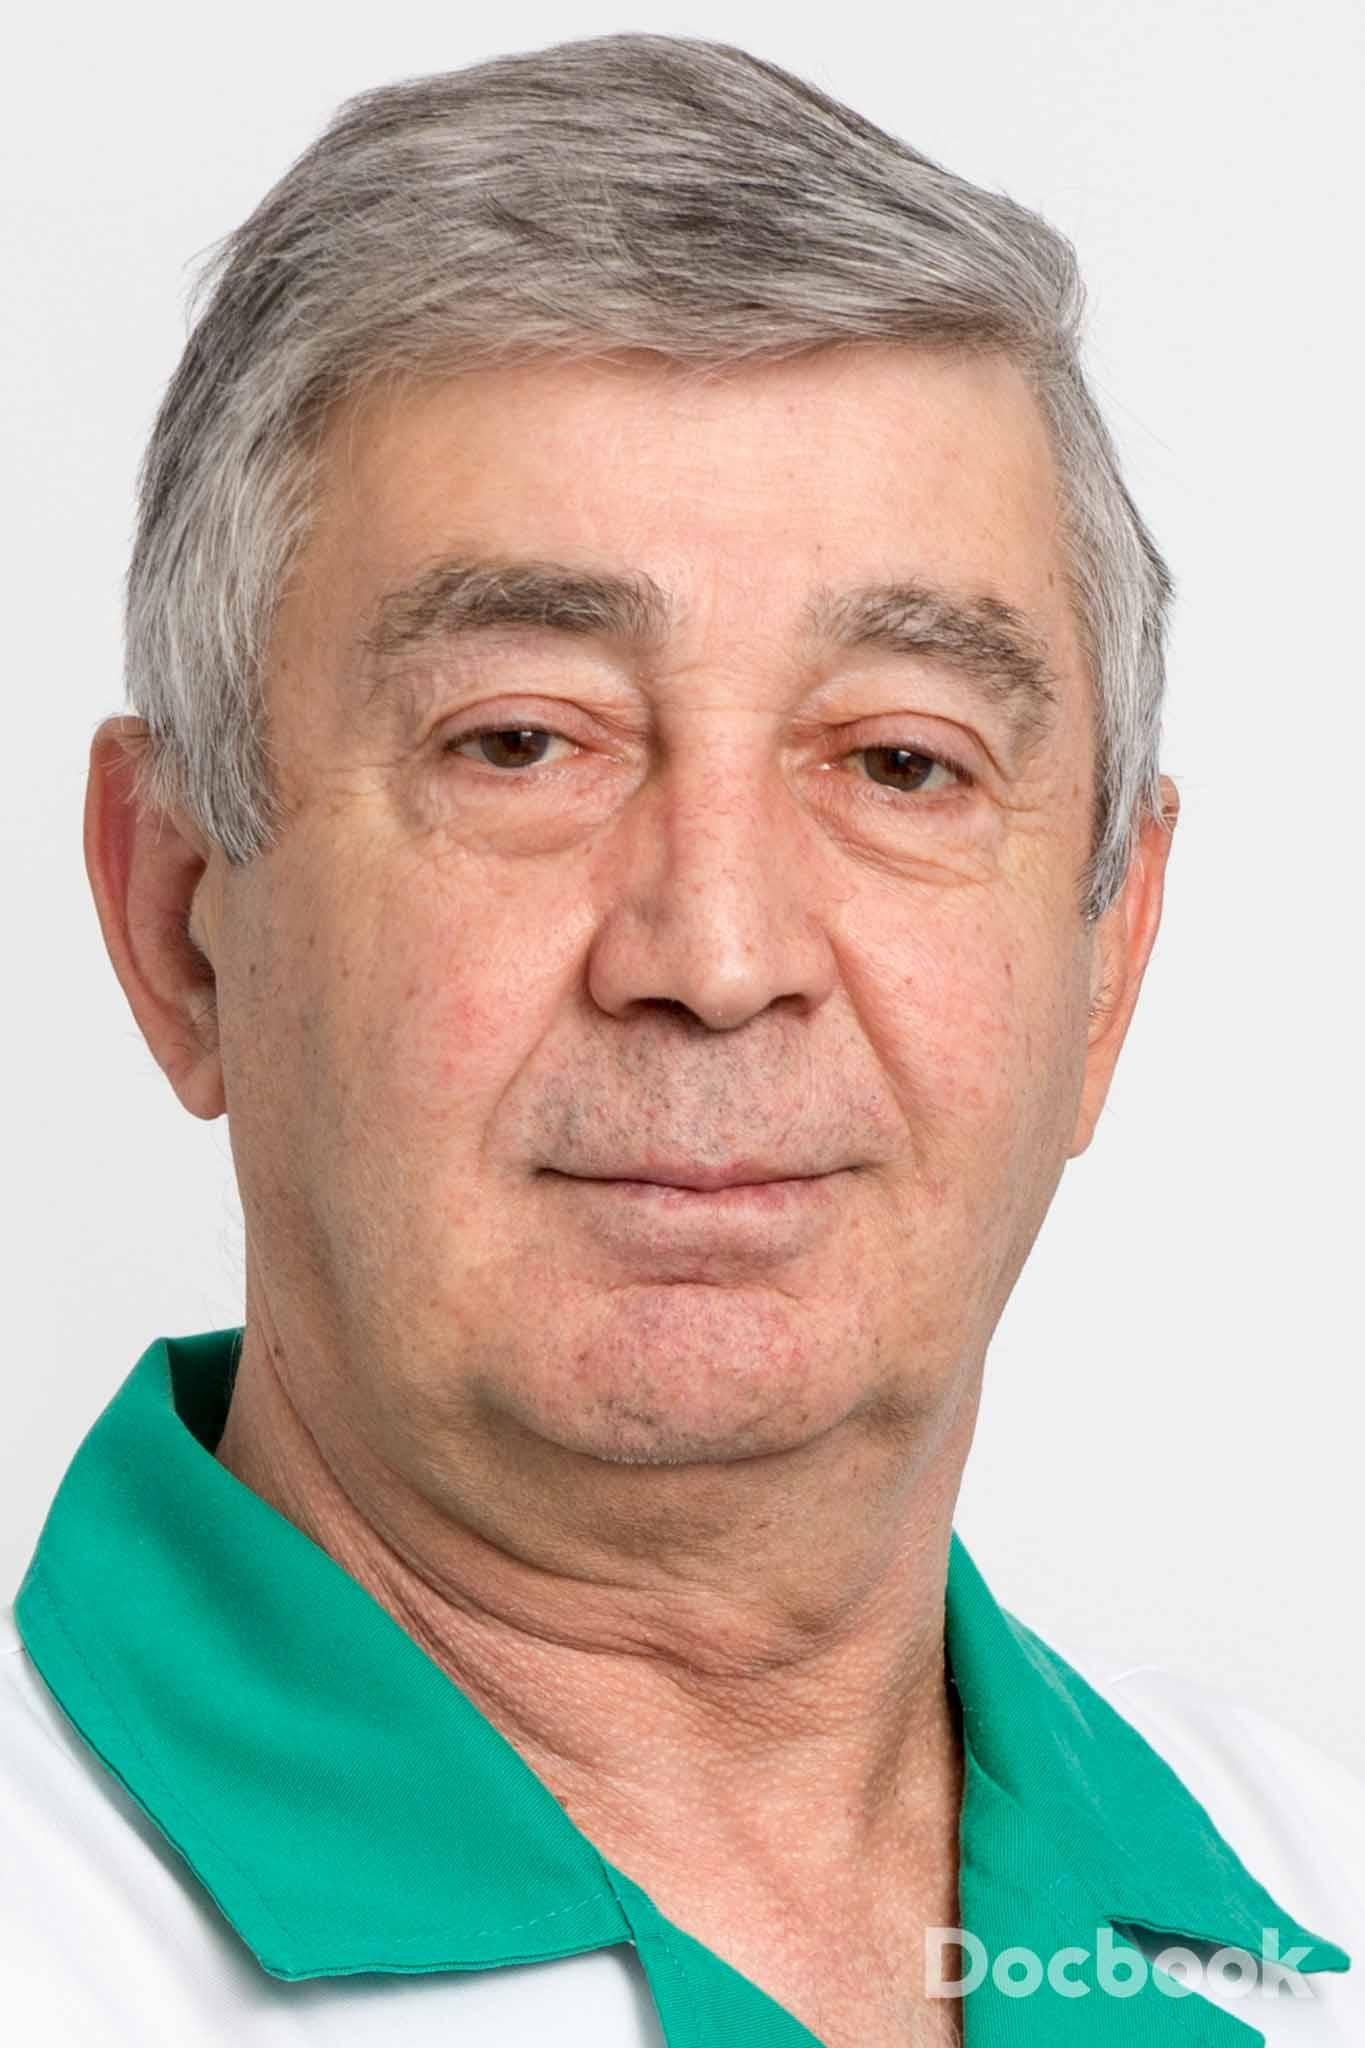 Dr. Viorel-Aurel Olar